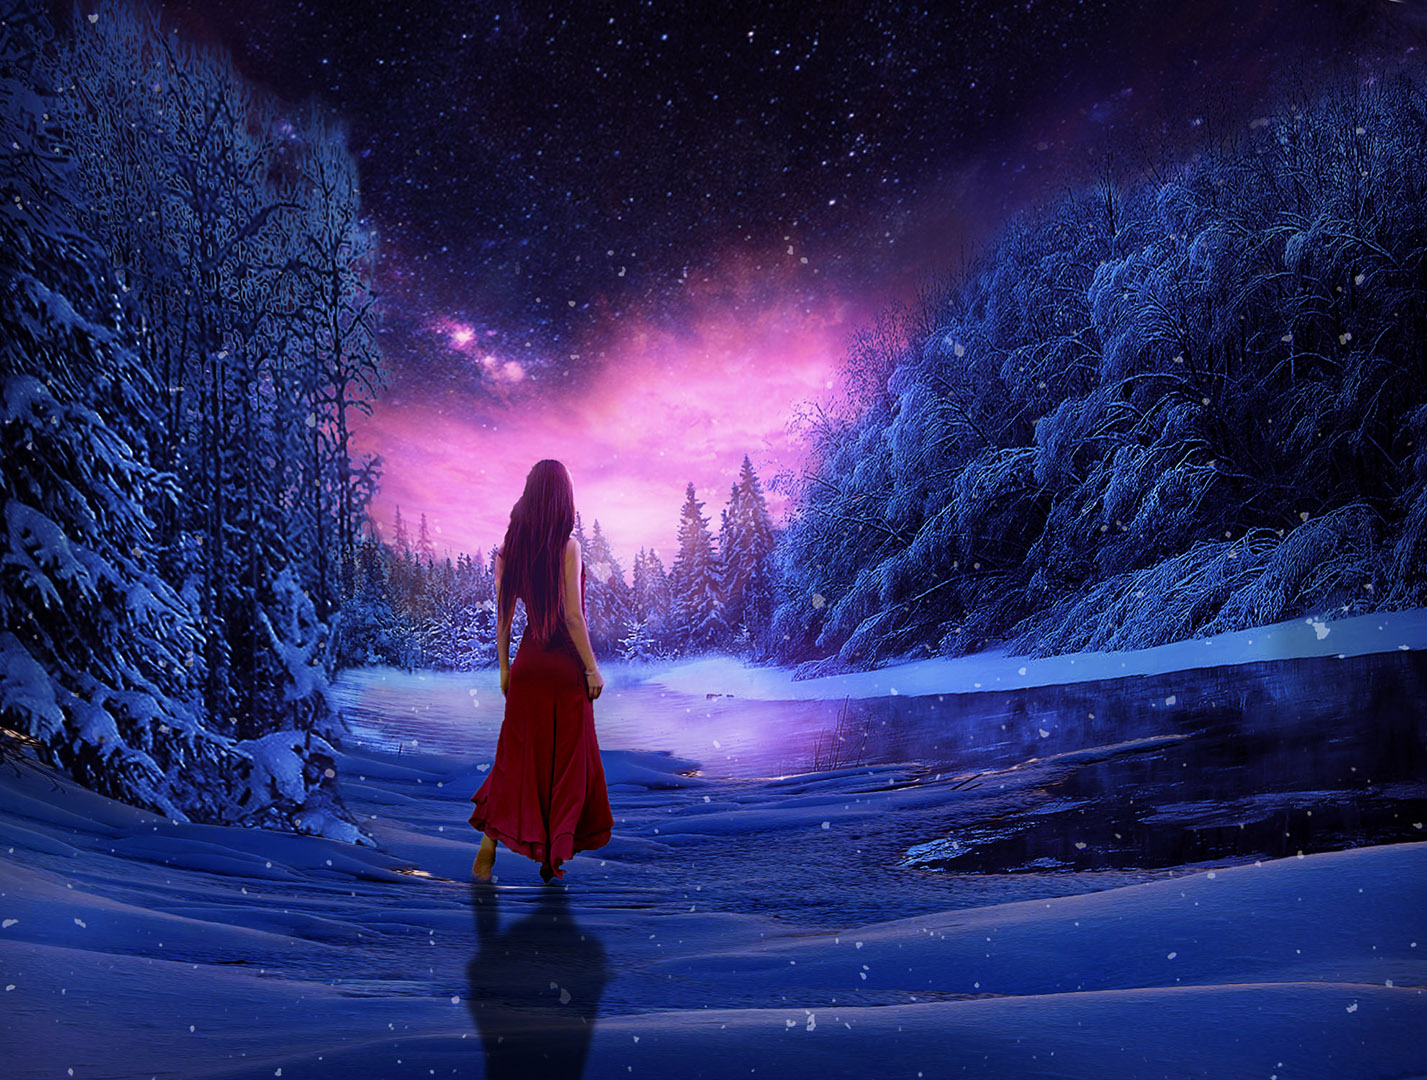 Tetyana Boronylo – Alluring light – 1ST